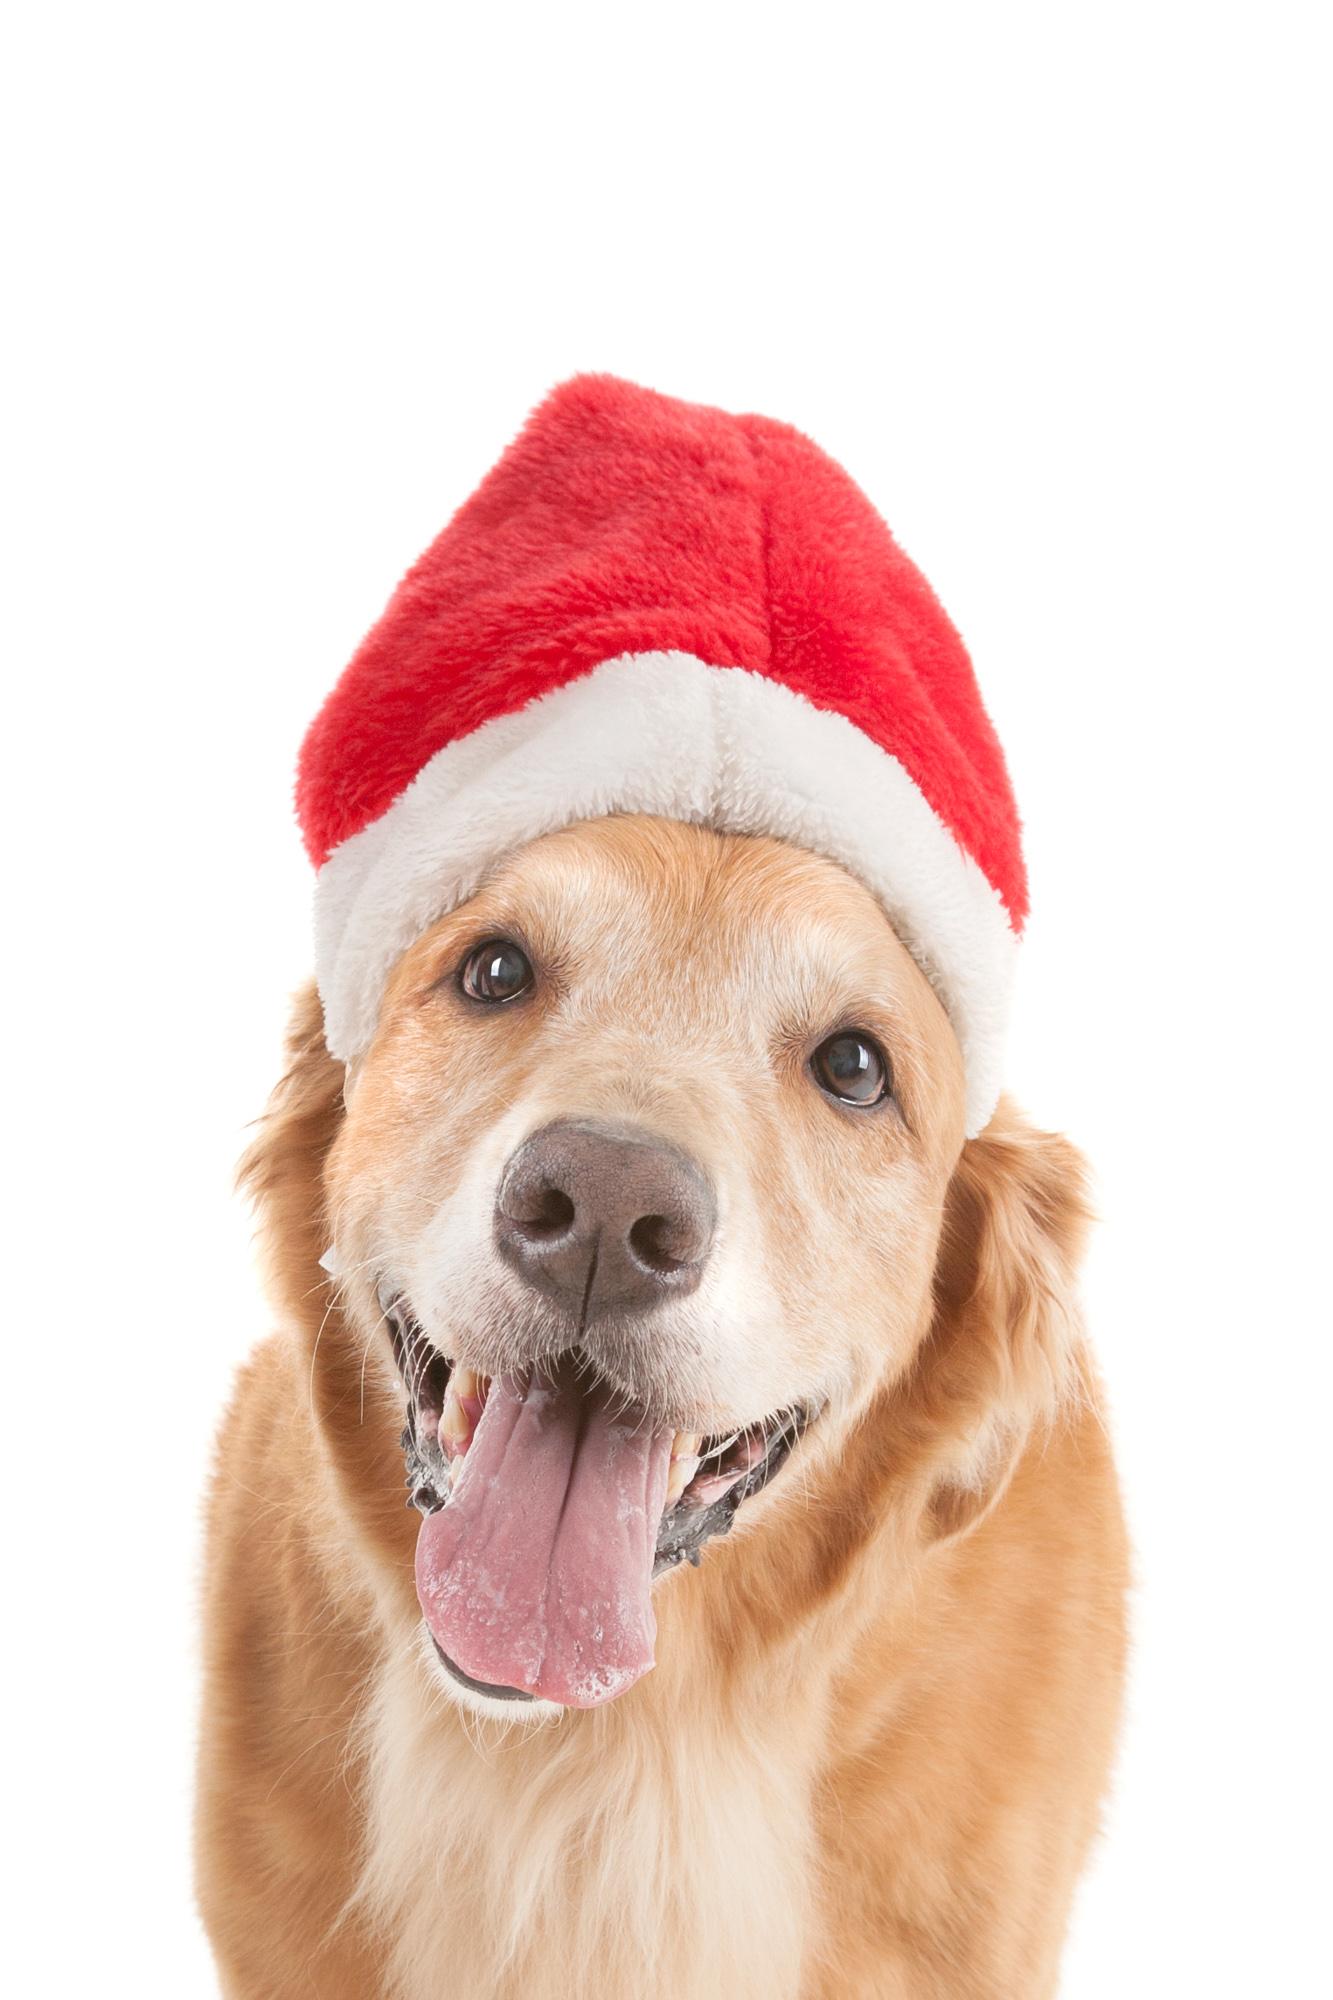 Golden+Retriever+with+Santa+hat.jpg